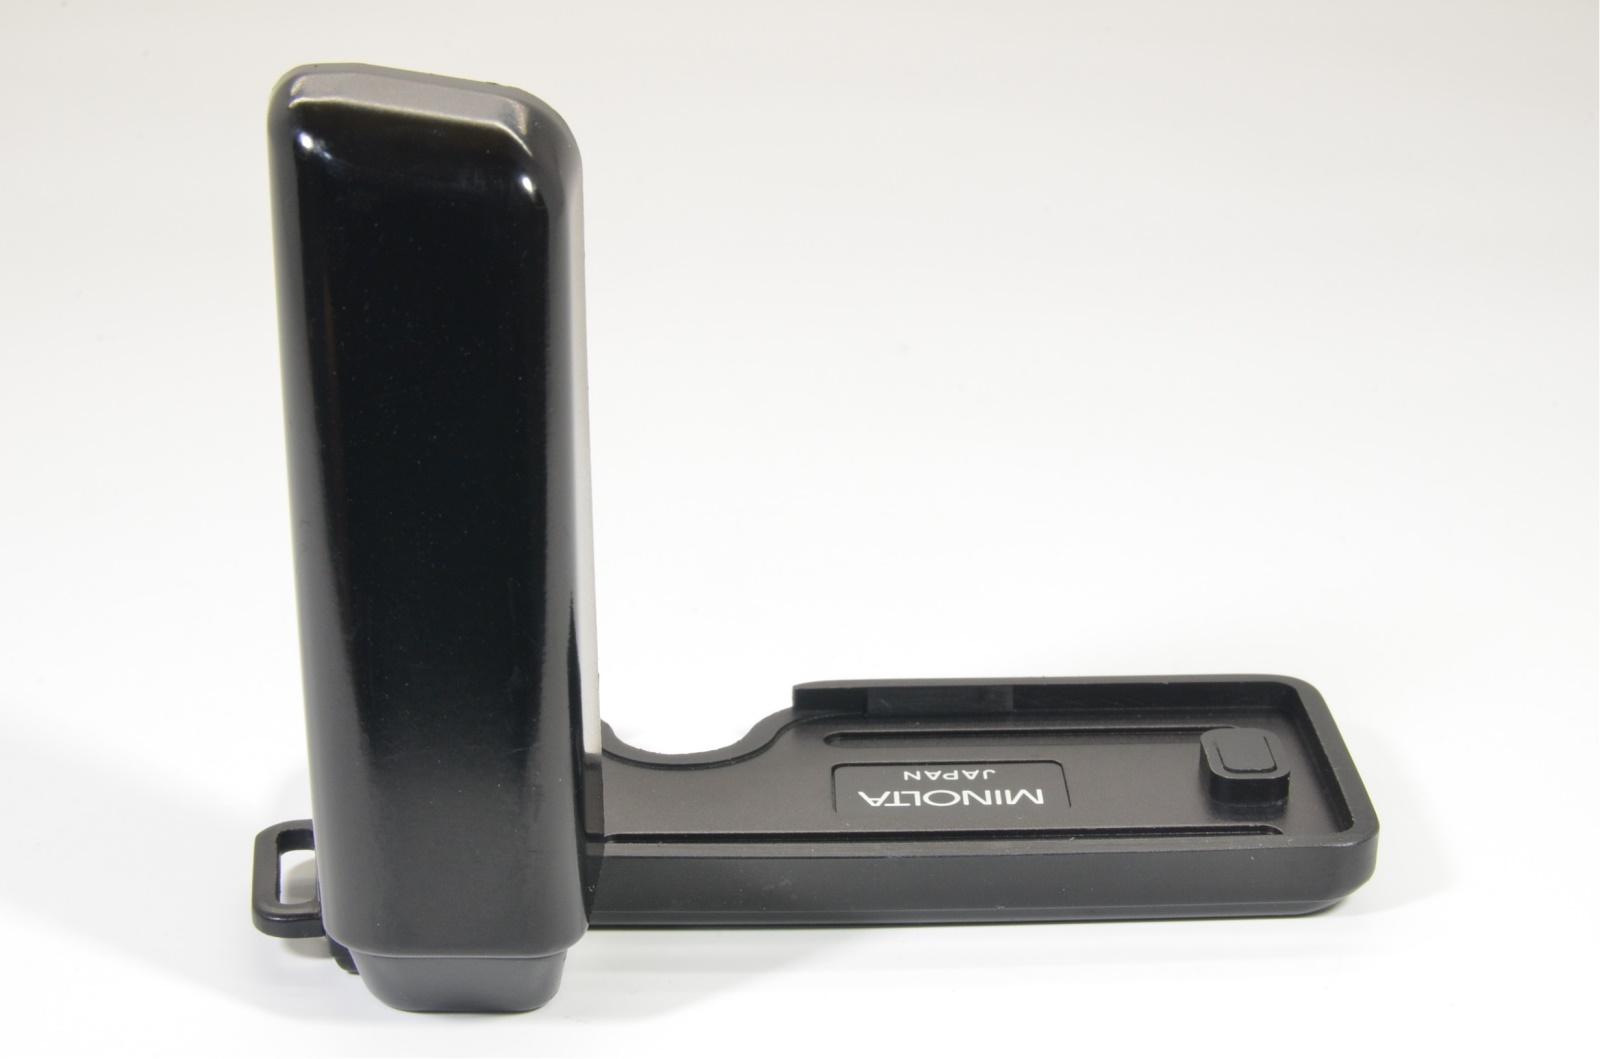 minolta cle film camera, m-rokkor lenses 40mm, 90mm, flash, grip shooting tested